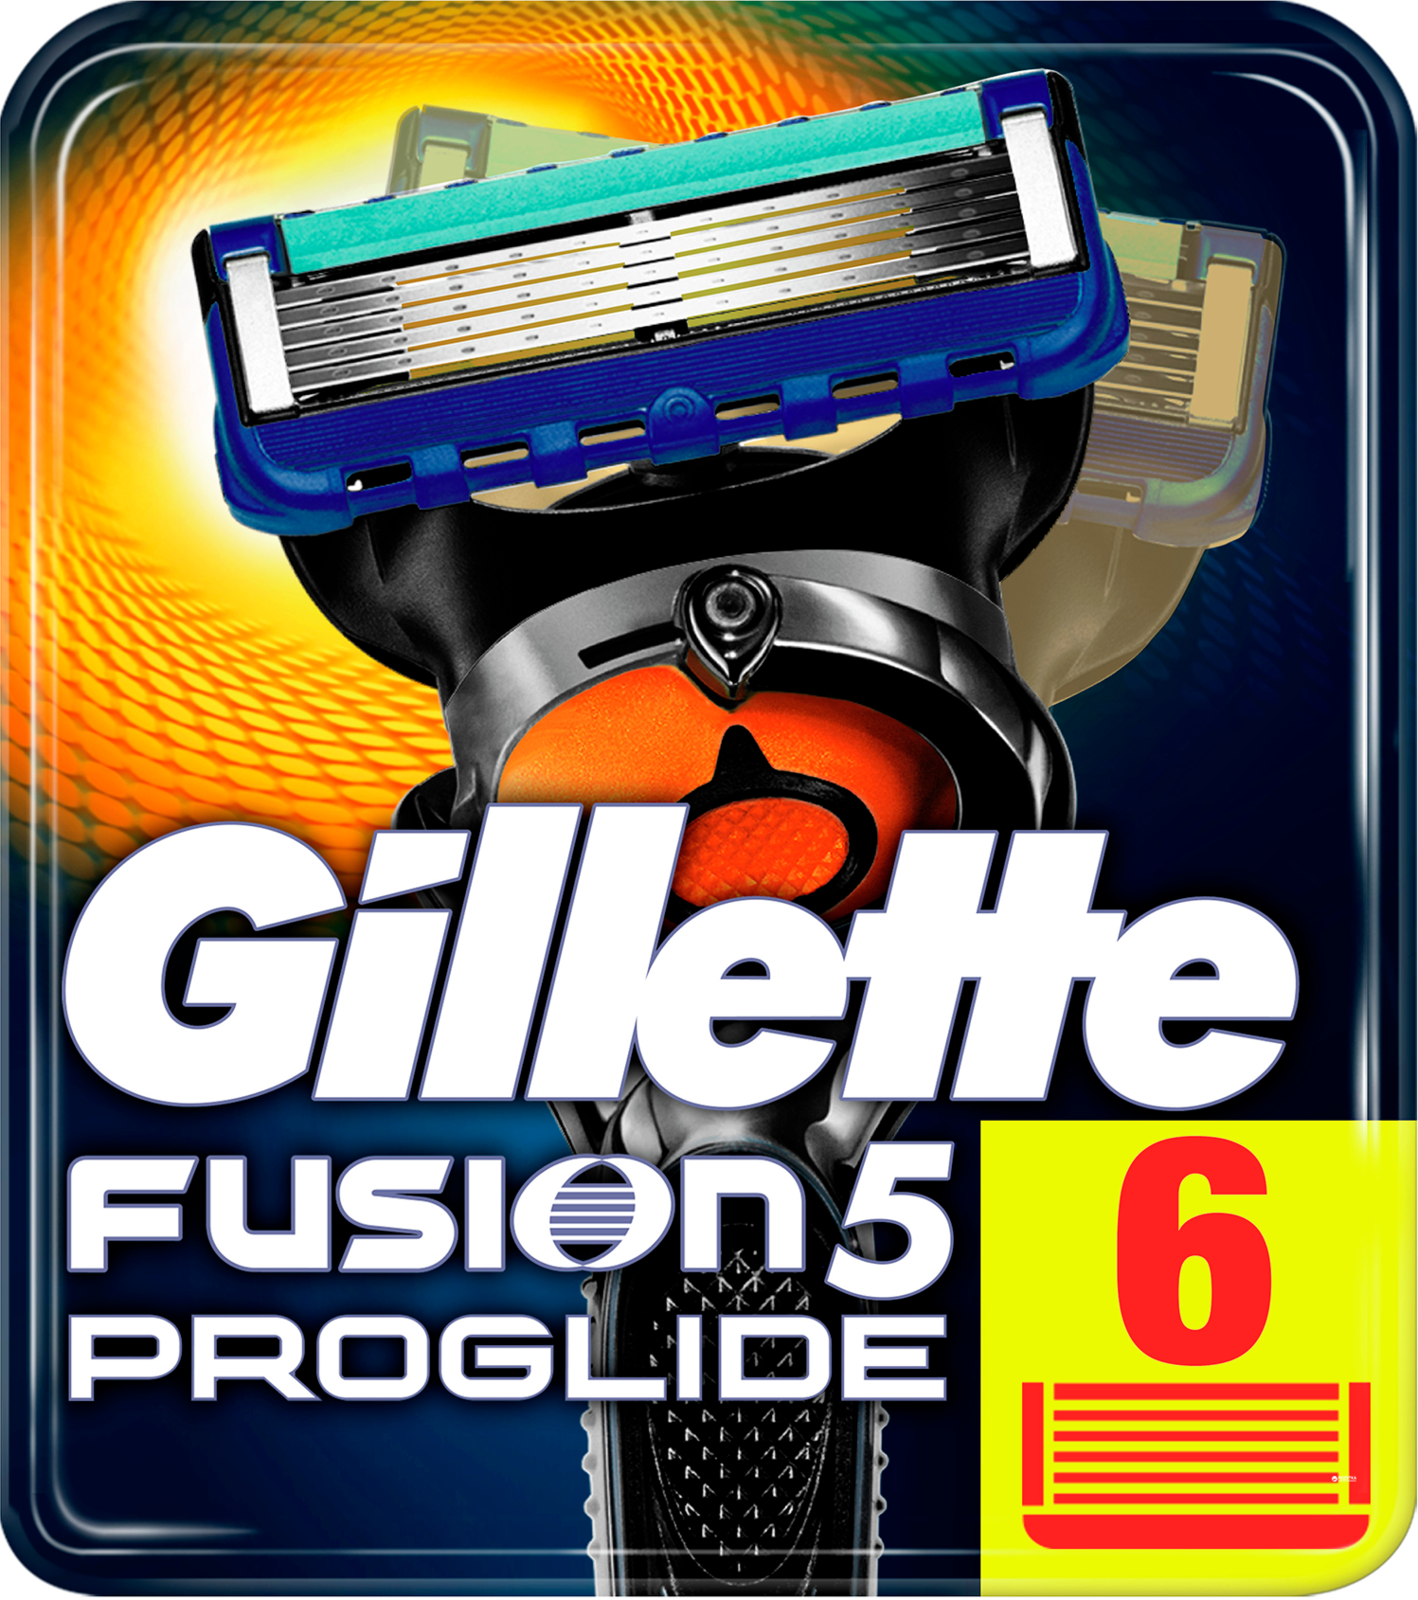 Сменные кассеты Gillette Fusion5 ProGlide, 6 шт сменные кассеты для мужской бритвы fusion proglide gillette 6 шт